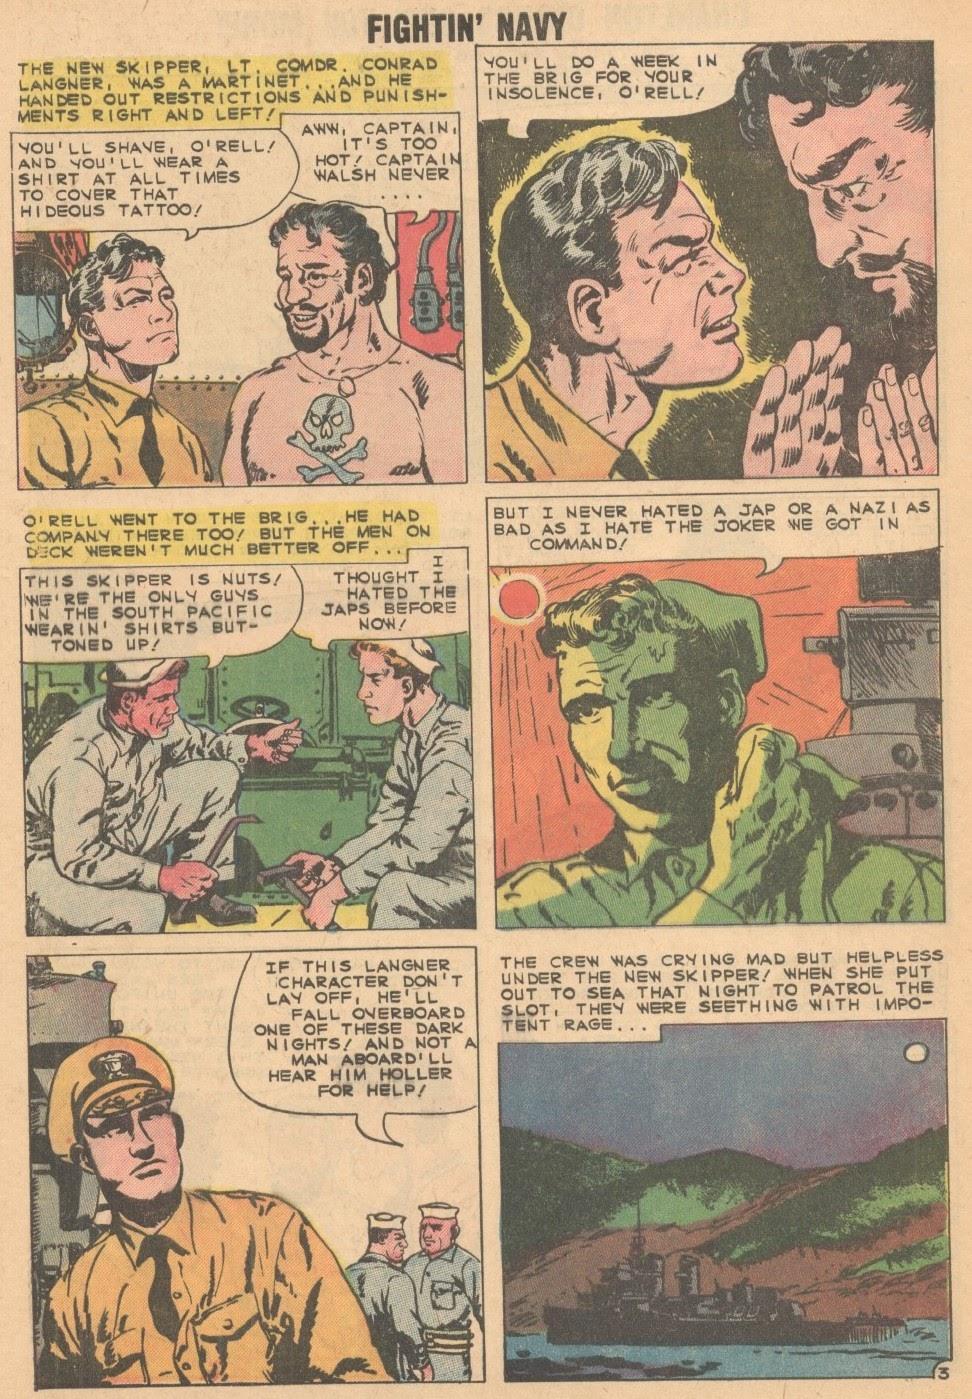 Read online Fightin' Navy comic -  Issue #93 - 28